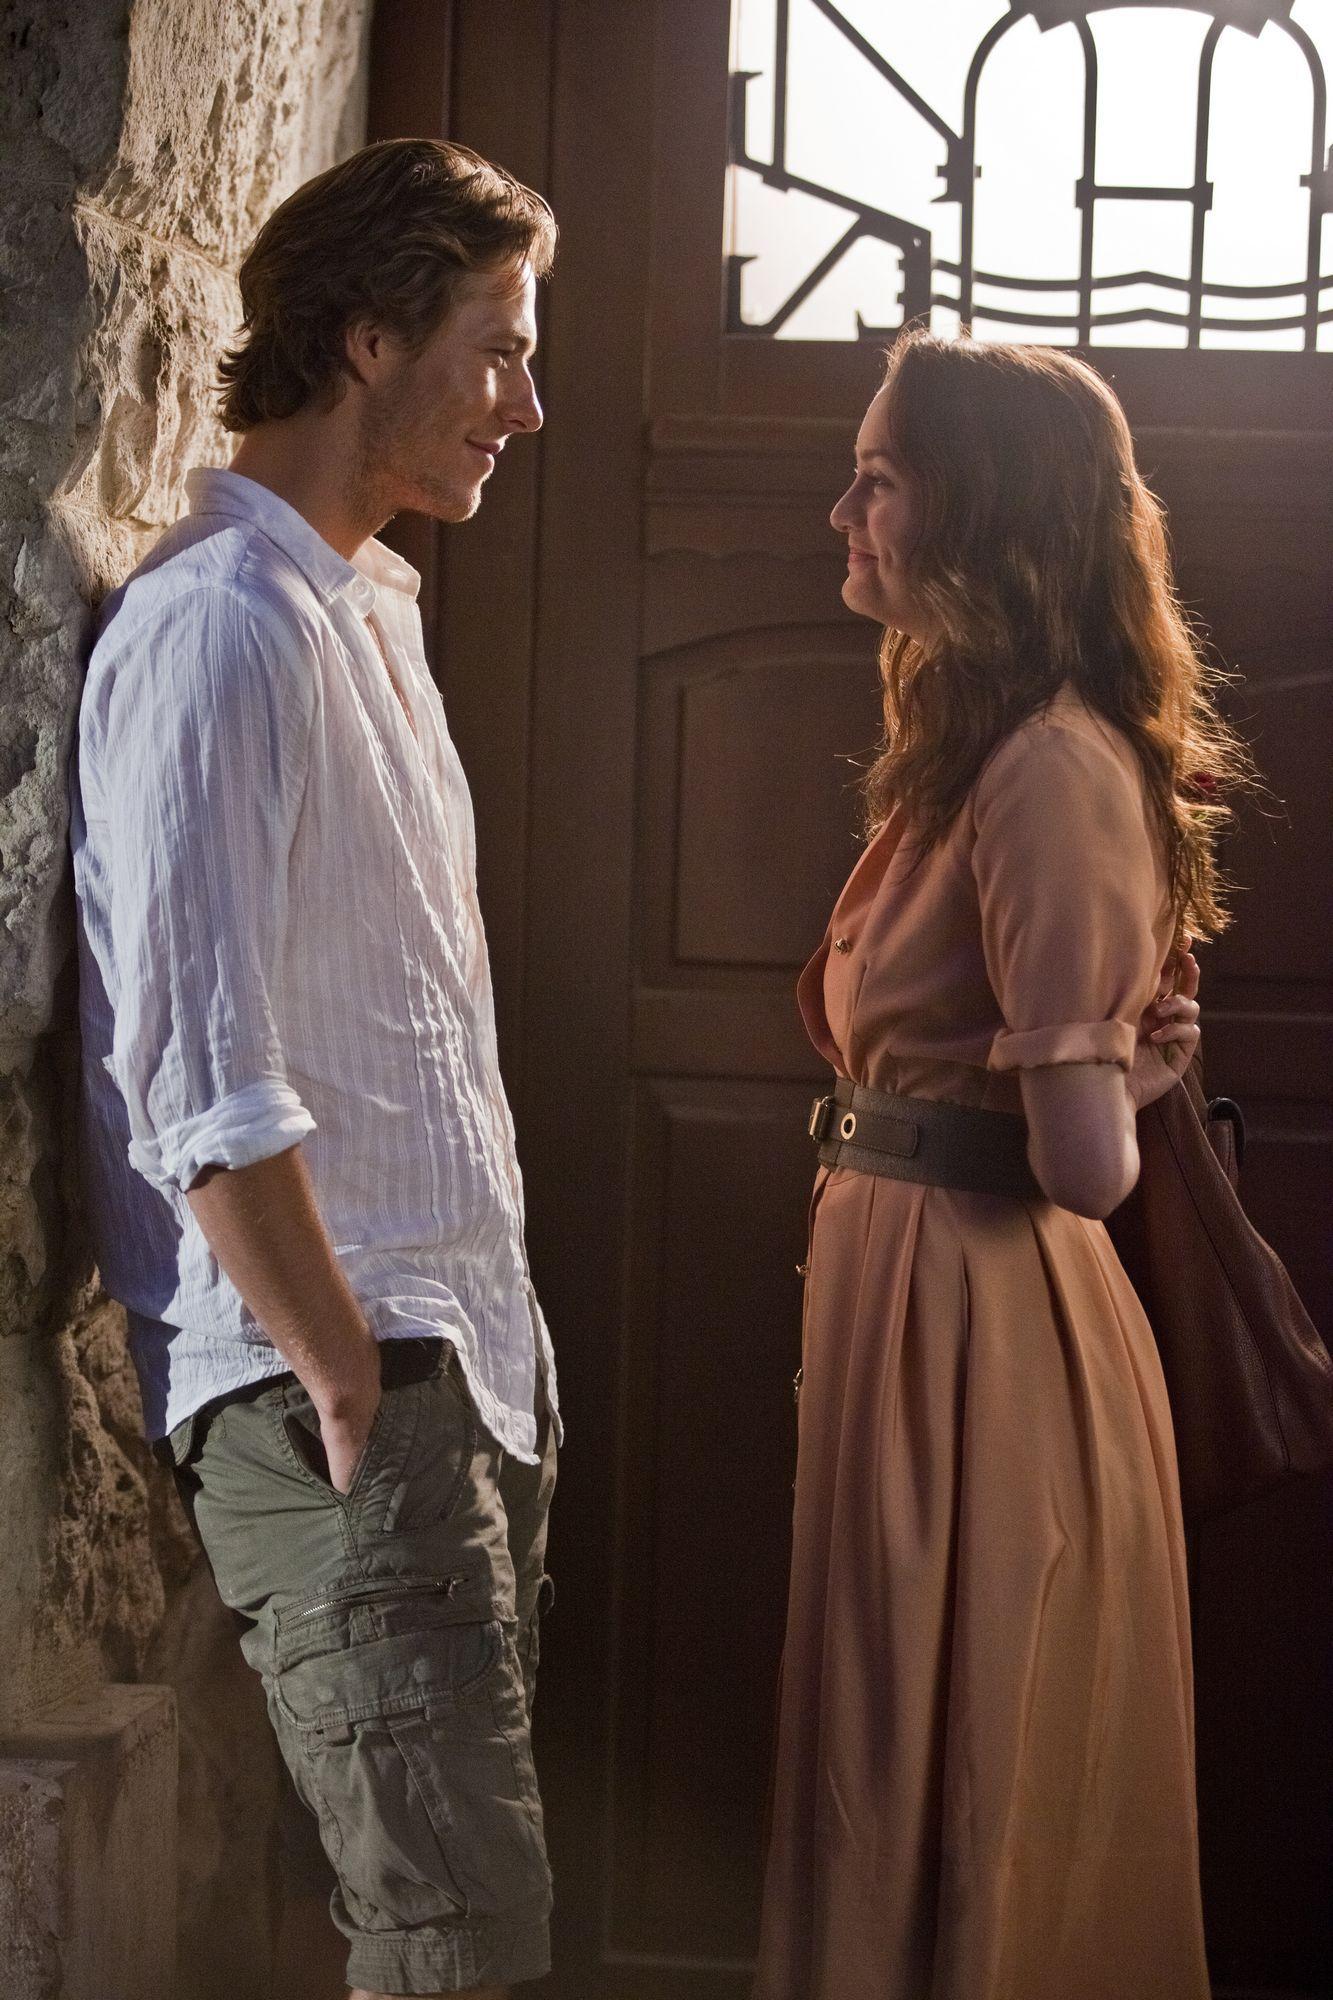 Monte Carlo 2011 Luke Bracey Riley Leighton Meester Meg Monte Carlo Movie Luke Bracey Movie Couples